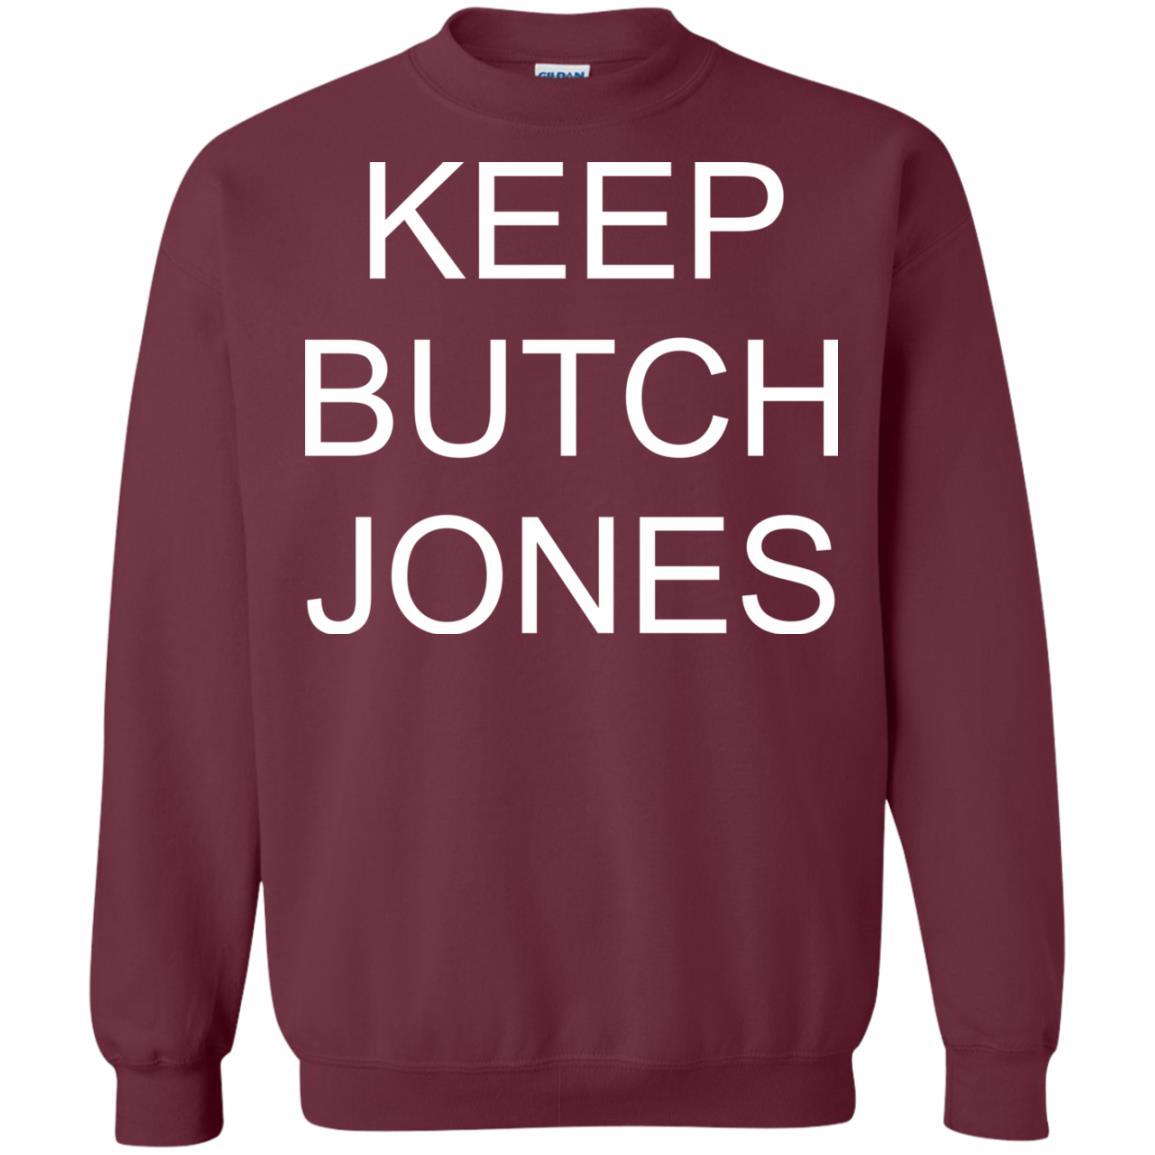 image 1436 - Keep Butch Jones shirt, sweater, long sleeve